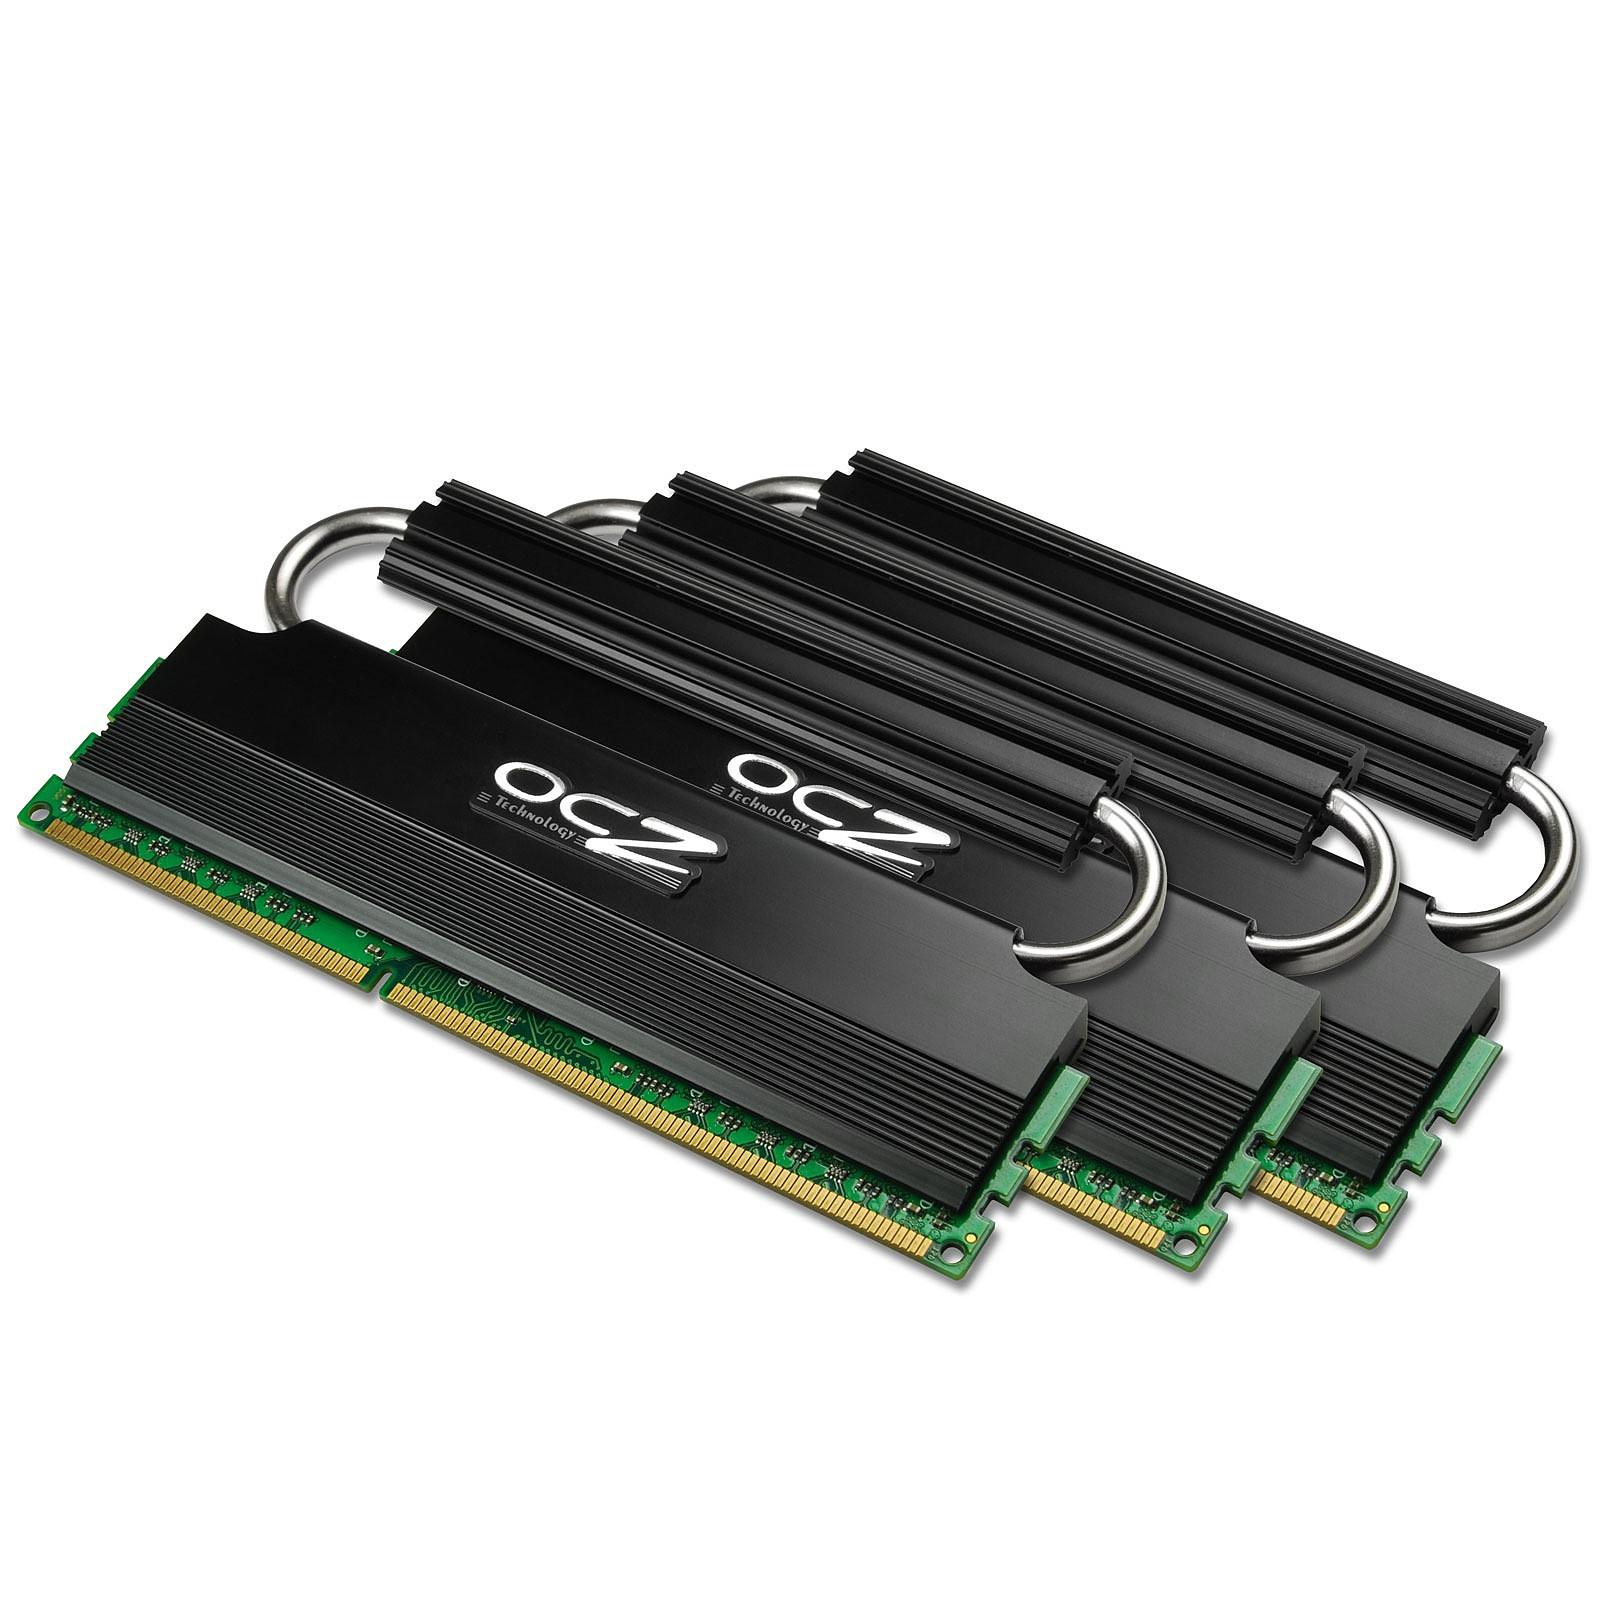 OCZ Reaper HPC 6 Go (3x 2Go) DDR3 1600 MHz